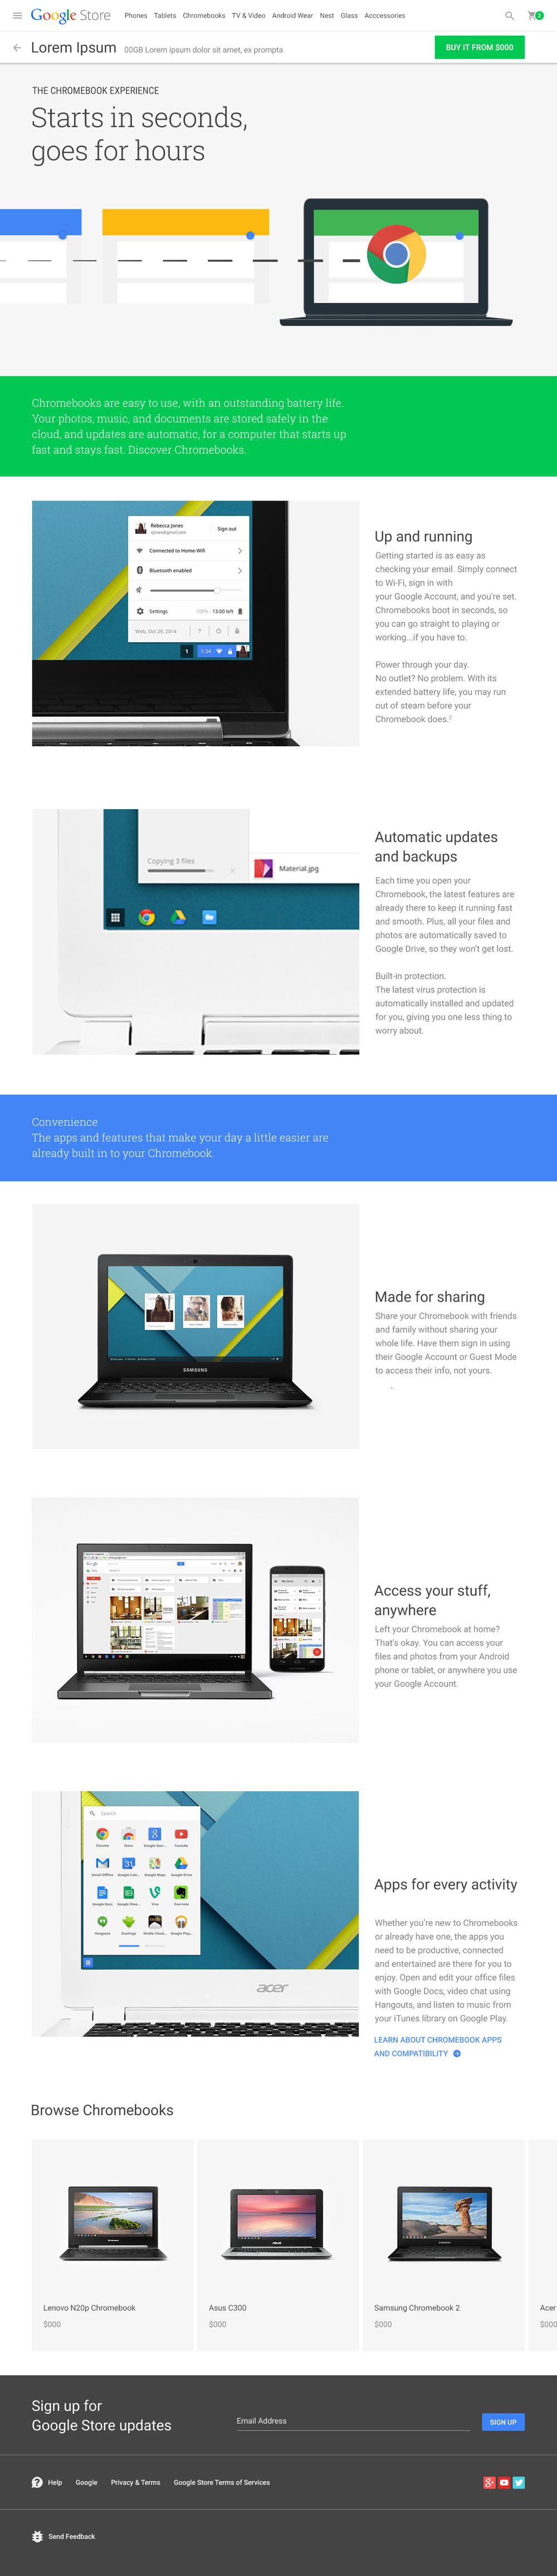 Chromebook Platform Story